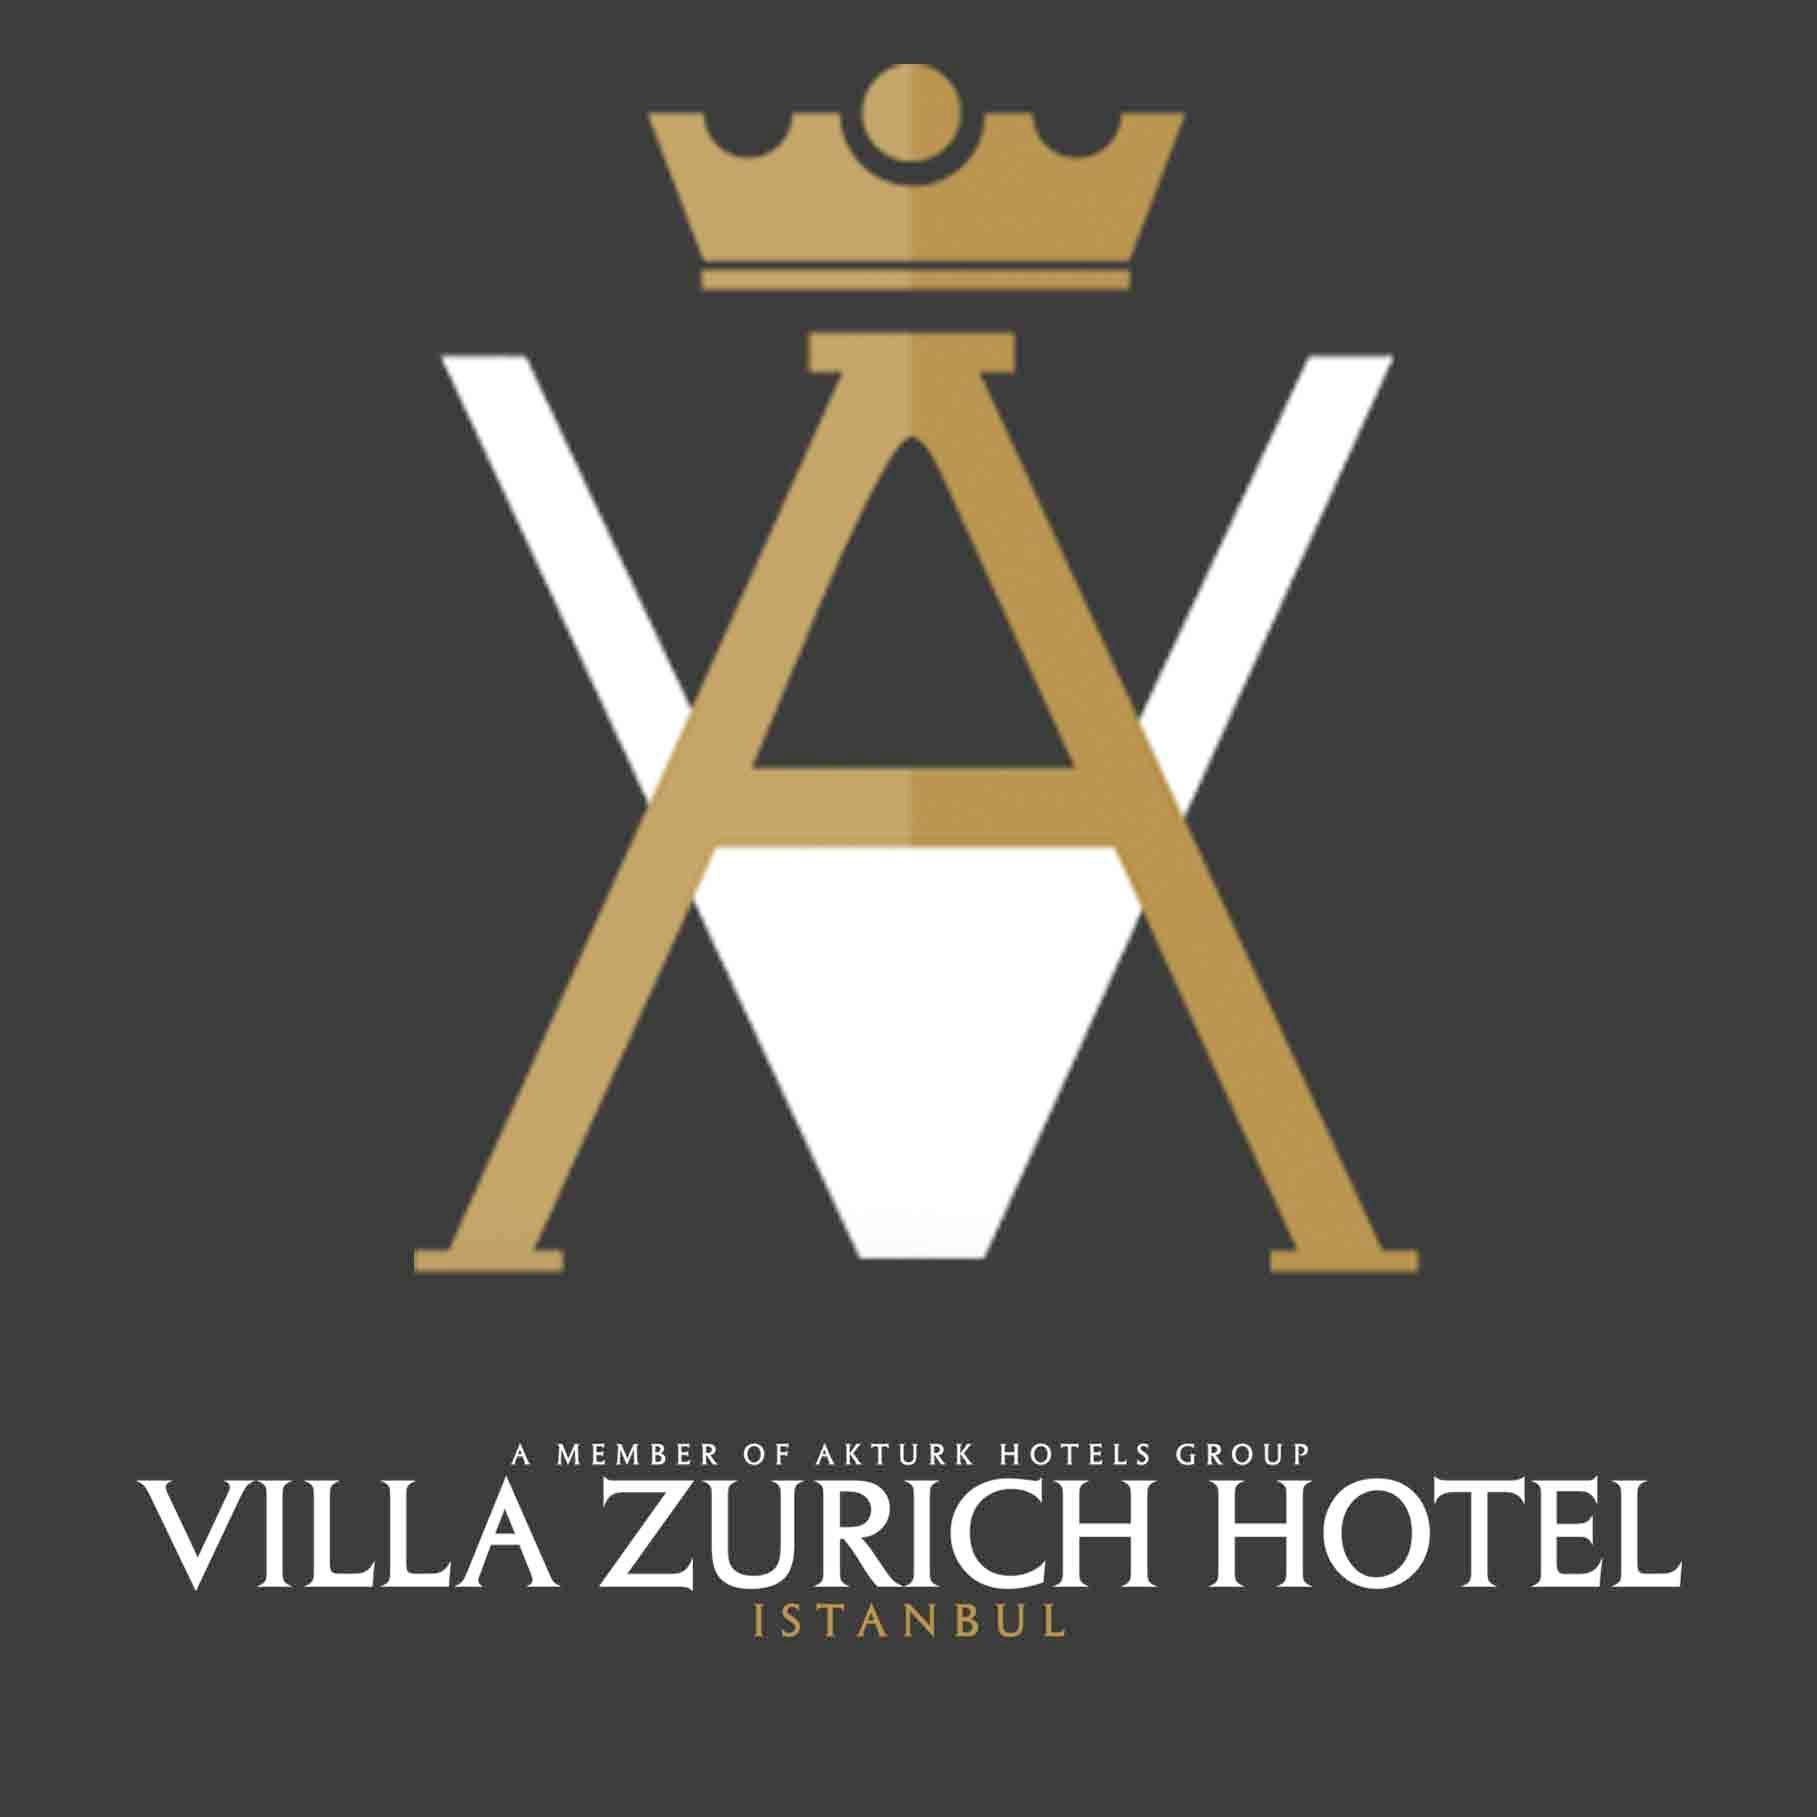 Hotel Villa Zurich  Twitter Hesabı Profil Fotoğrafı